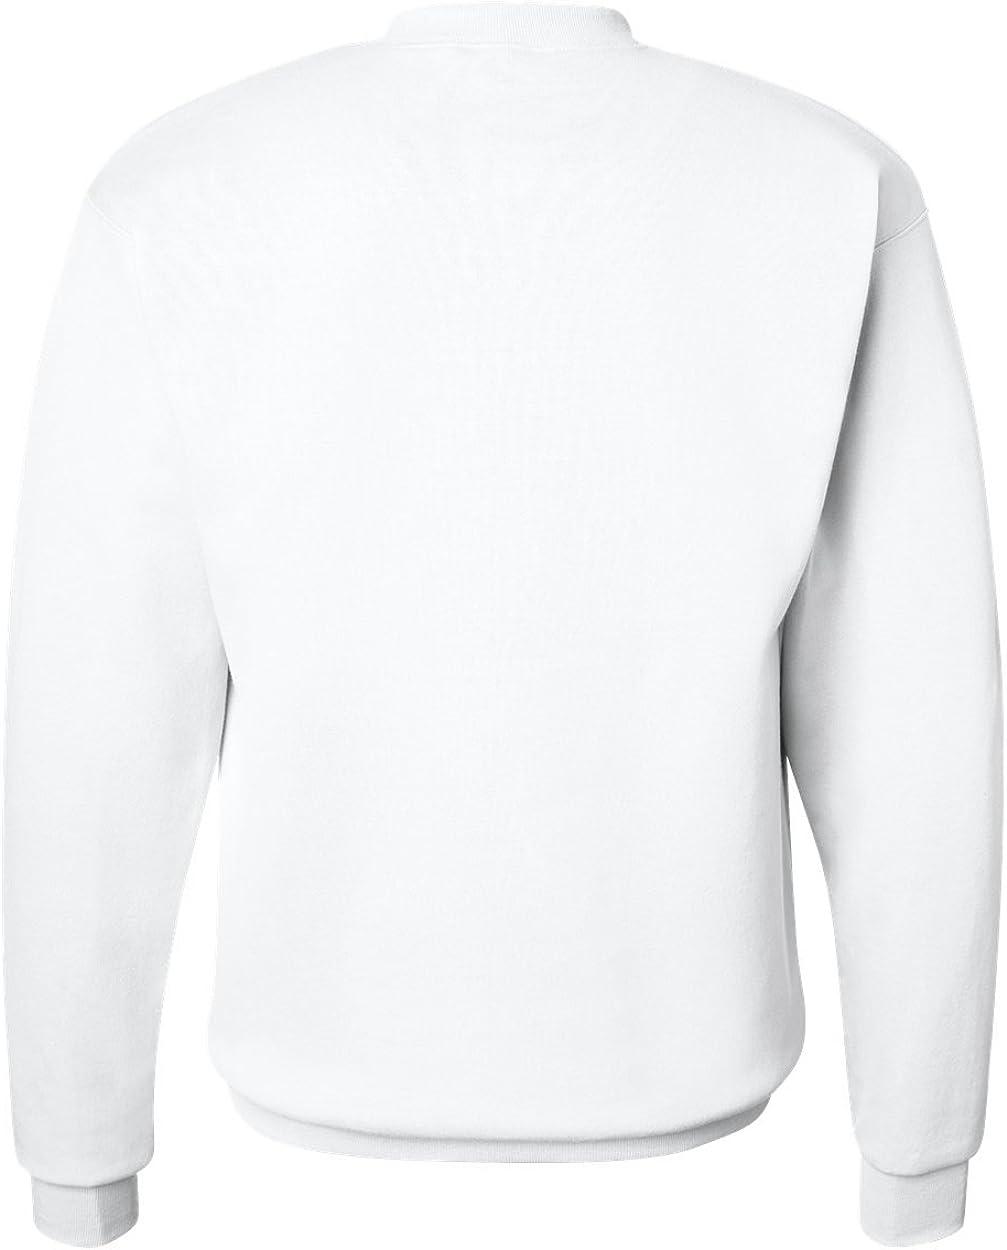 Small Hanes Mens EcoSmart Fleece Sweatshirt 1 Black // 1 Royal Pack of 2